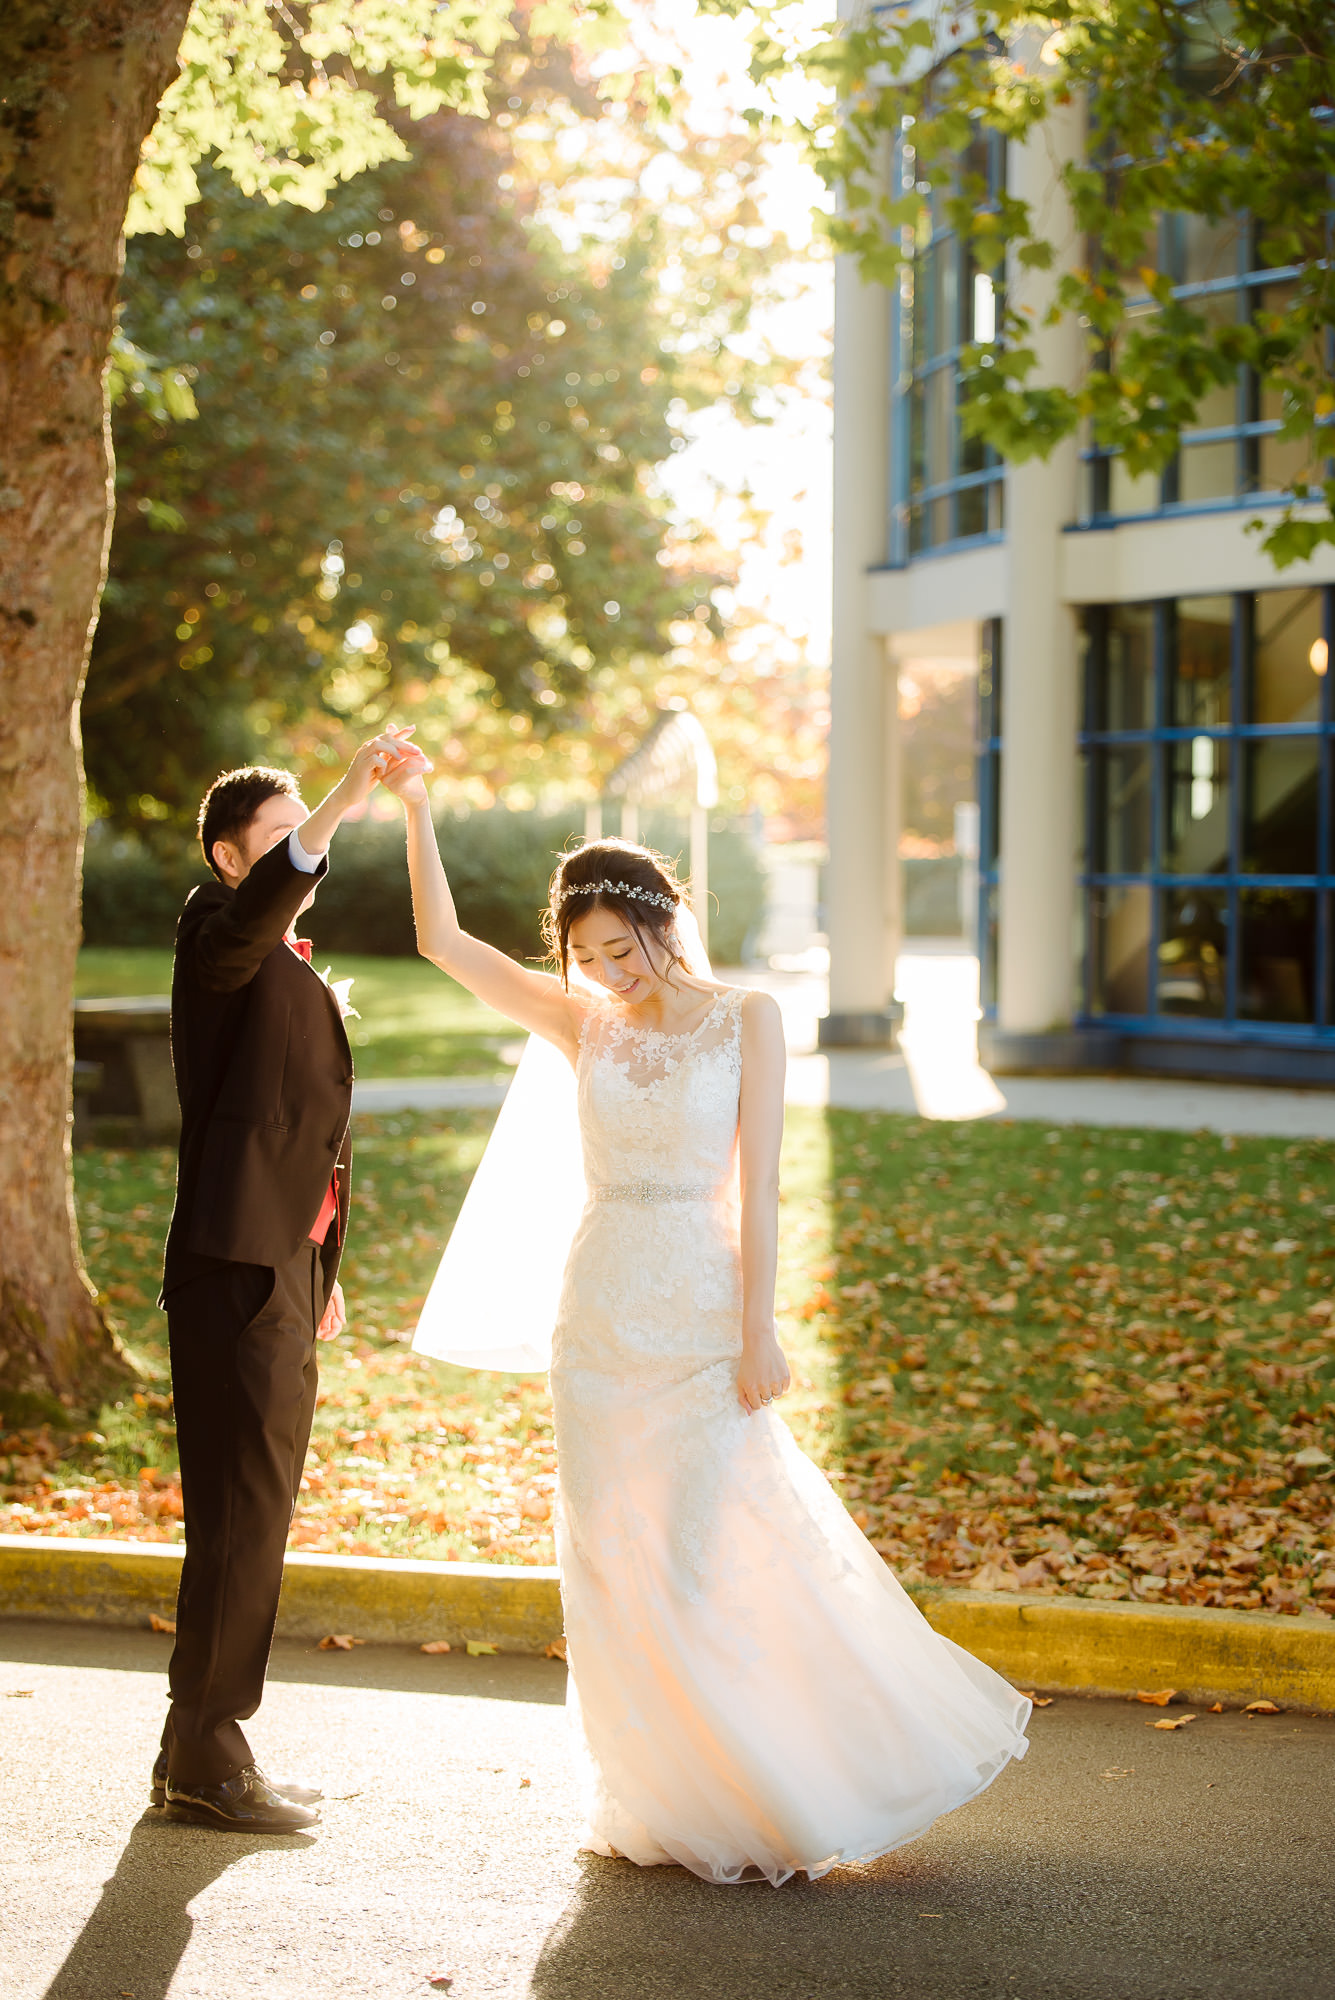 minoru_chapel_richmond_wedding_ceremony 17270123.jpg